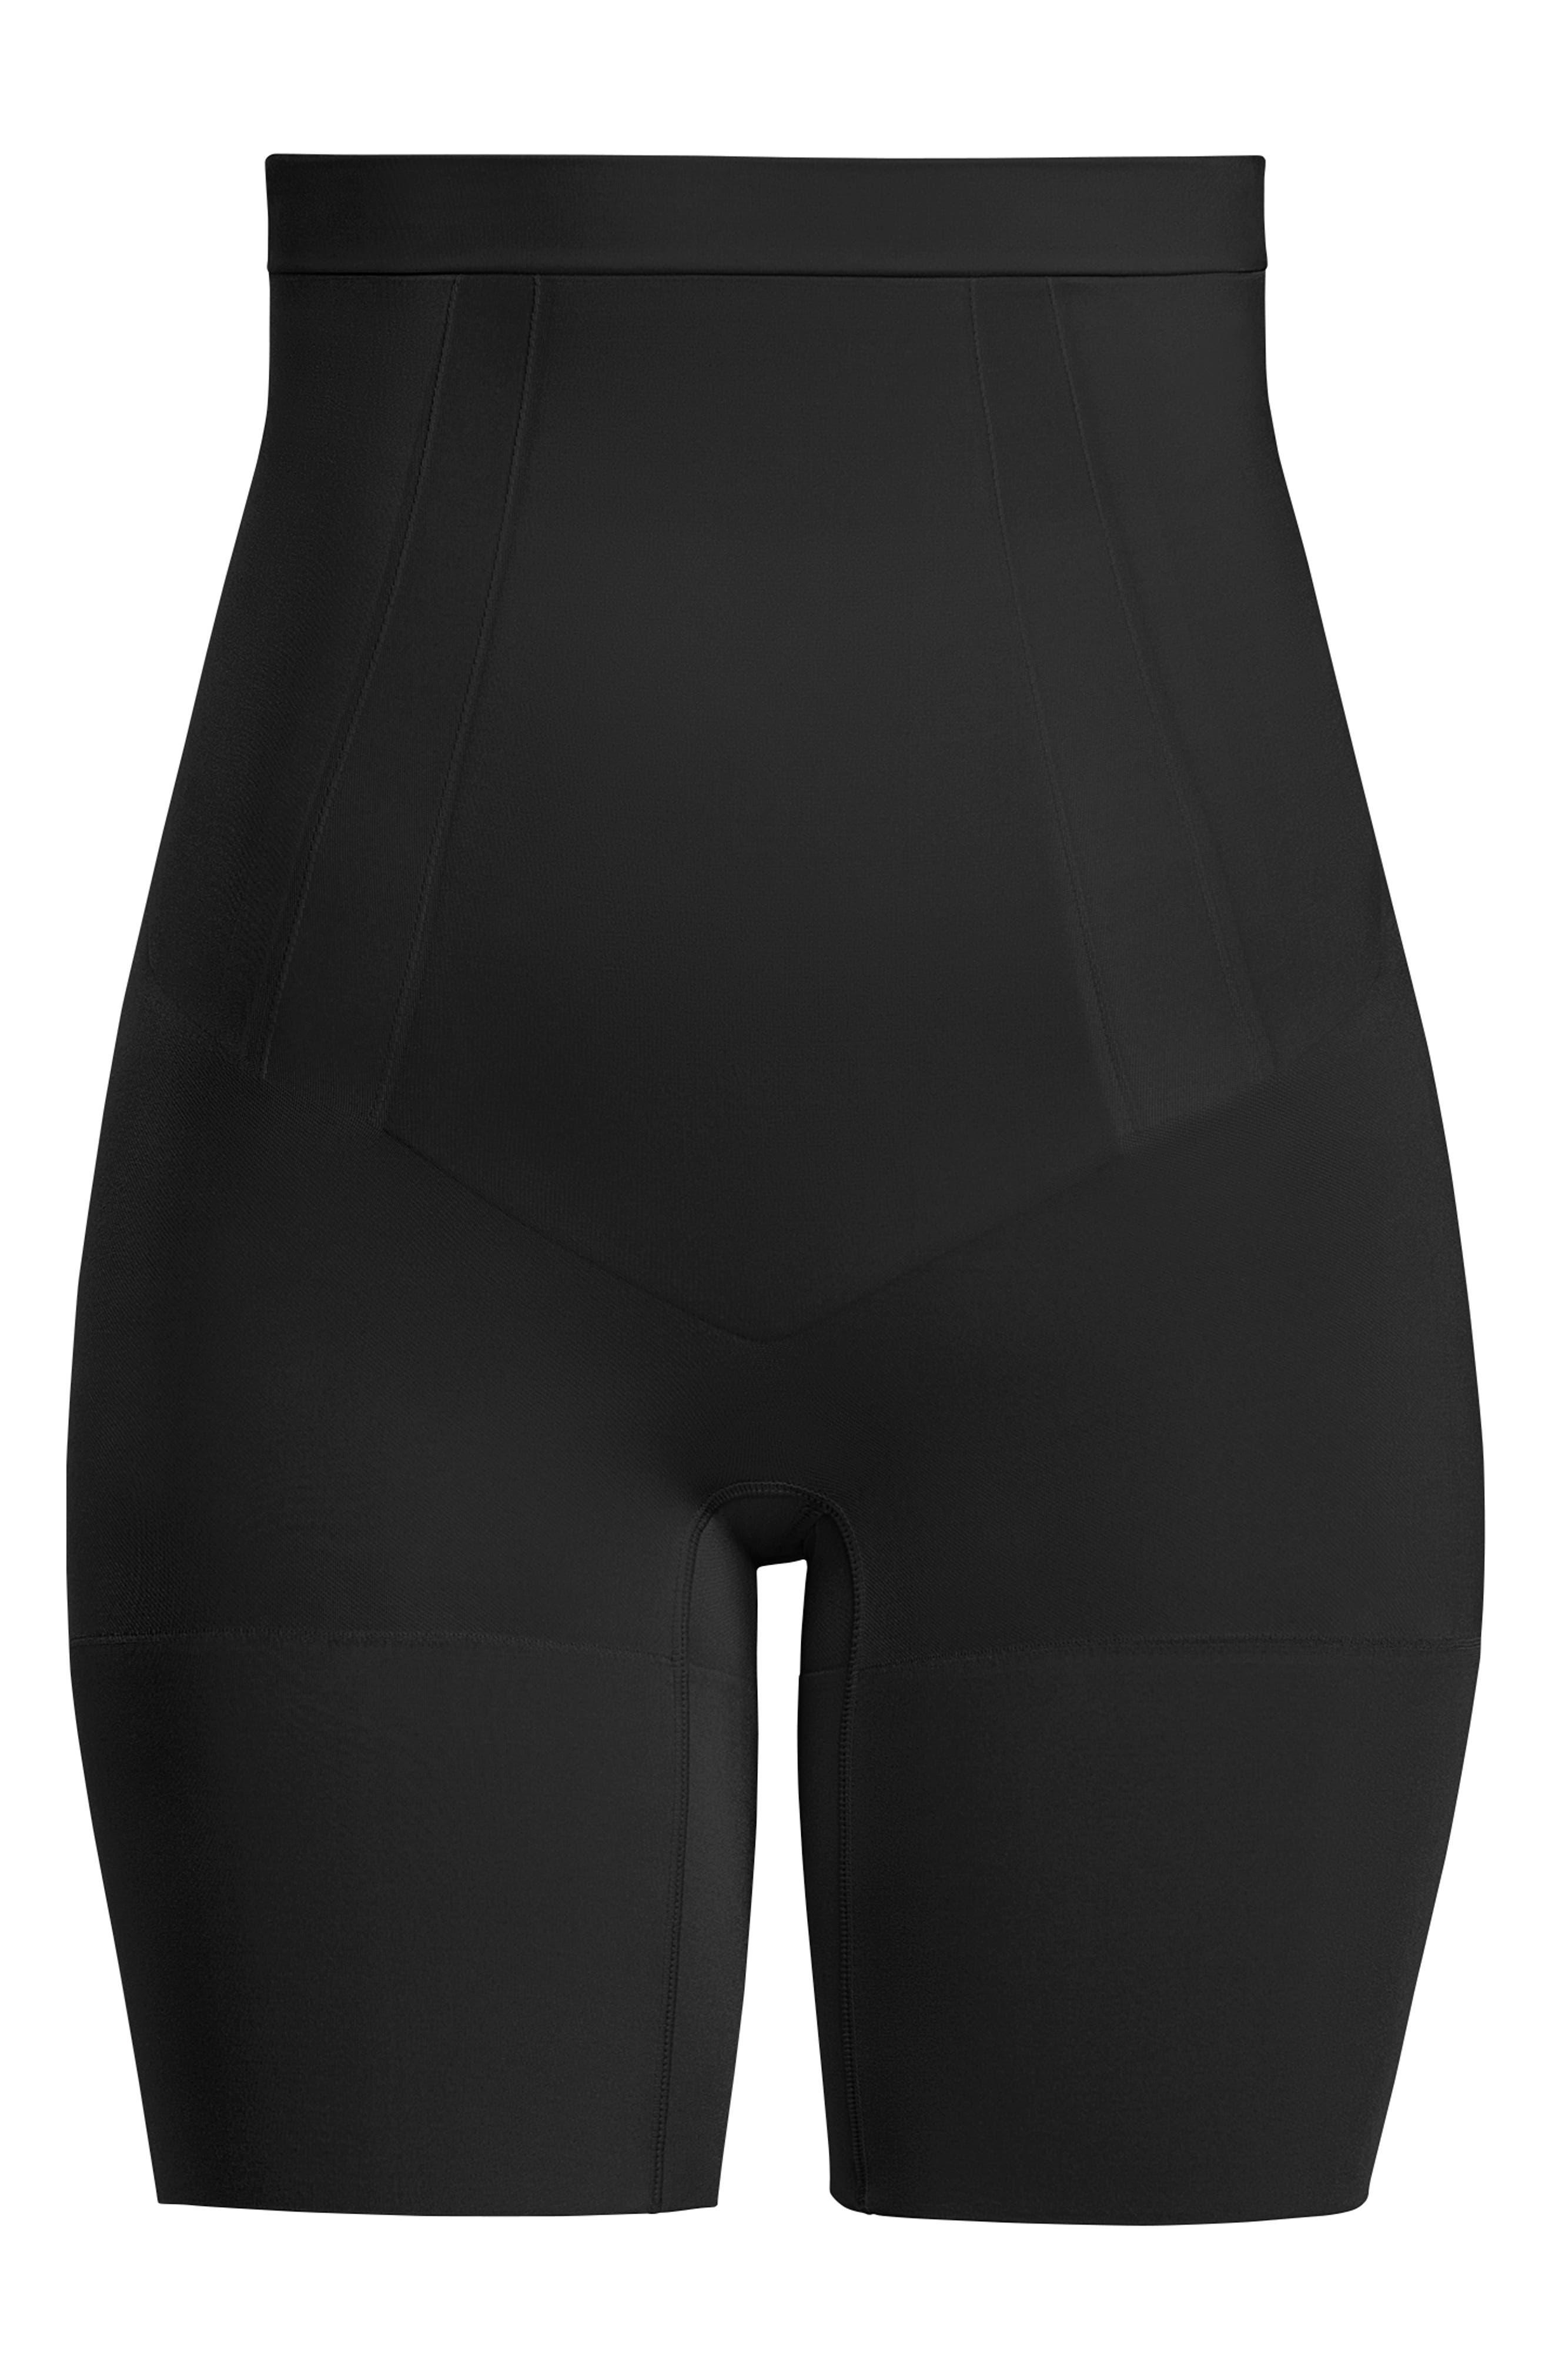 OnCore High Waist Mid Thigh Shaper,                         Main,                         color, BLACK